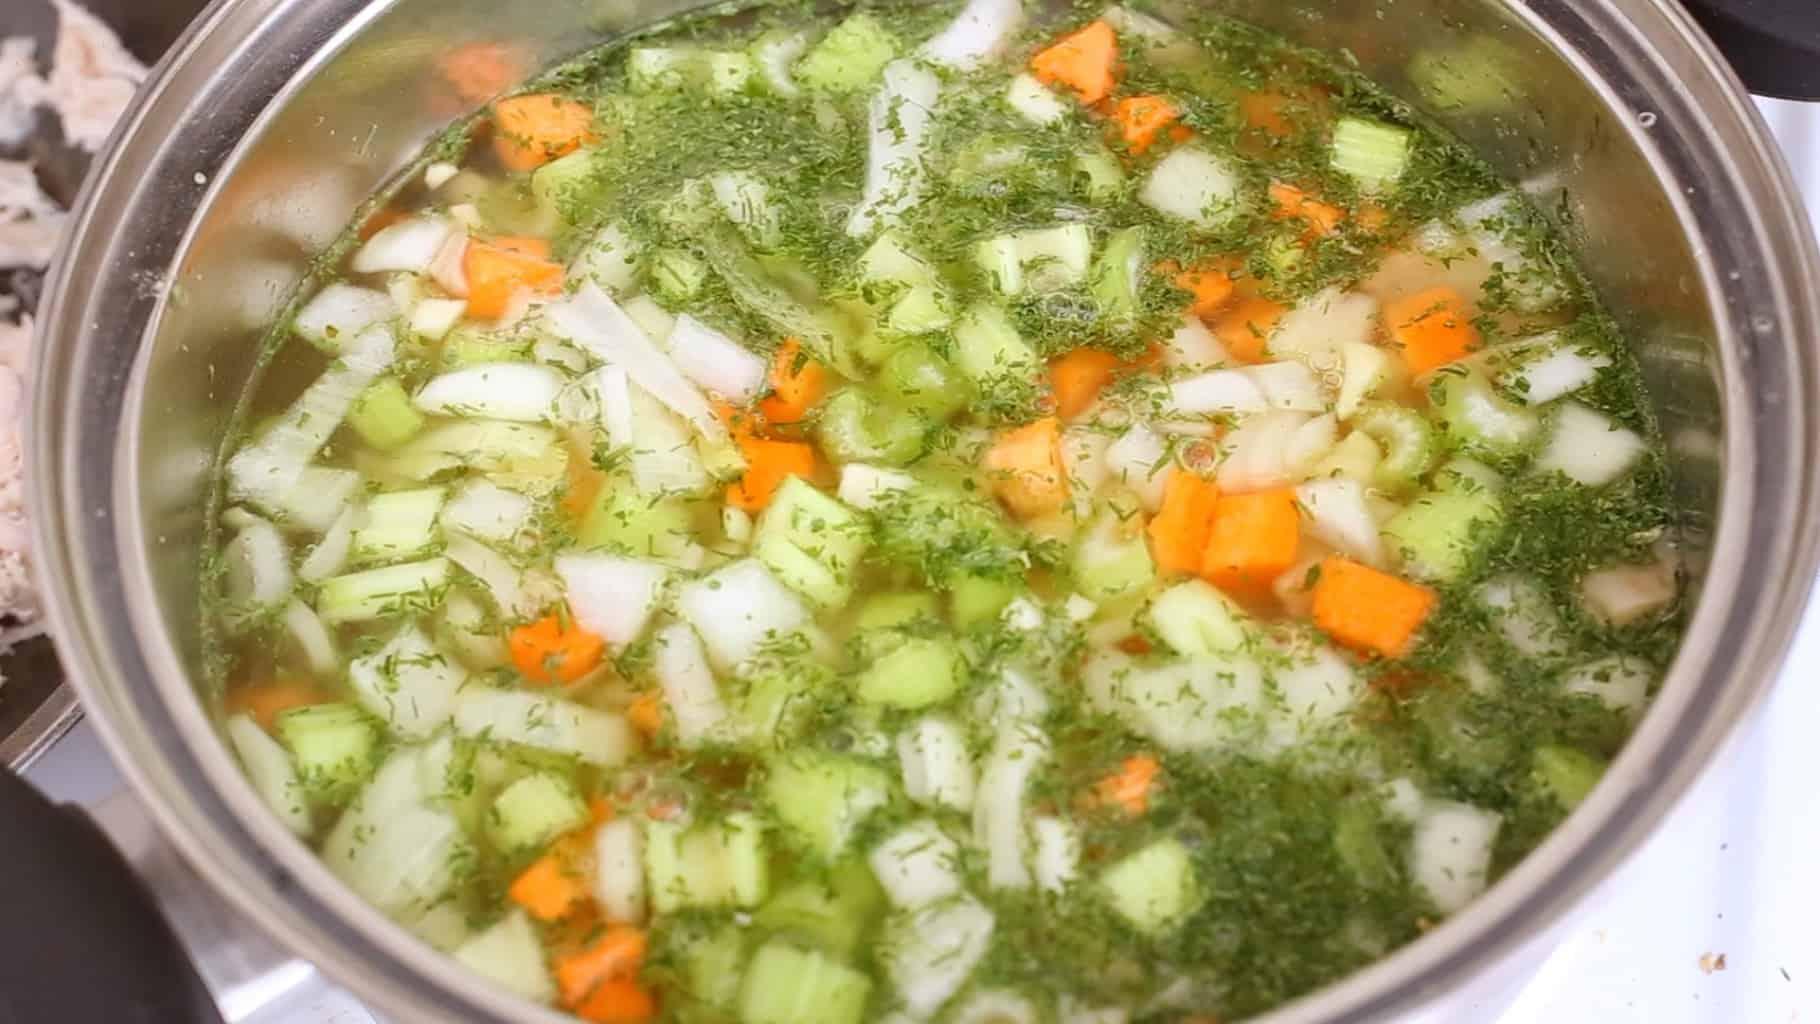 keto chicken noodle soup, keto chicken soup, keto chicken noodle soup recipe, keto chicken soup recipe, how to make keto chicken soup, how to make chicken soup keto, low carb chicken noodle soup, low carb chicken soup, low carb chicken soup recipe, keto diet chicken soup, keto soup, low carb soup,